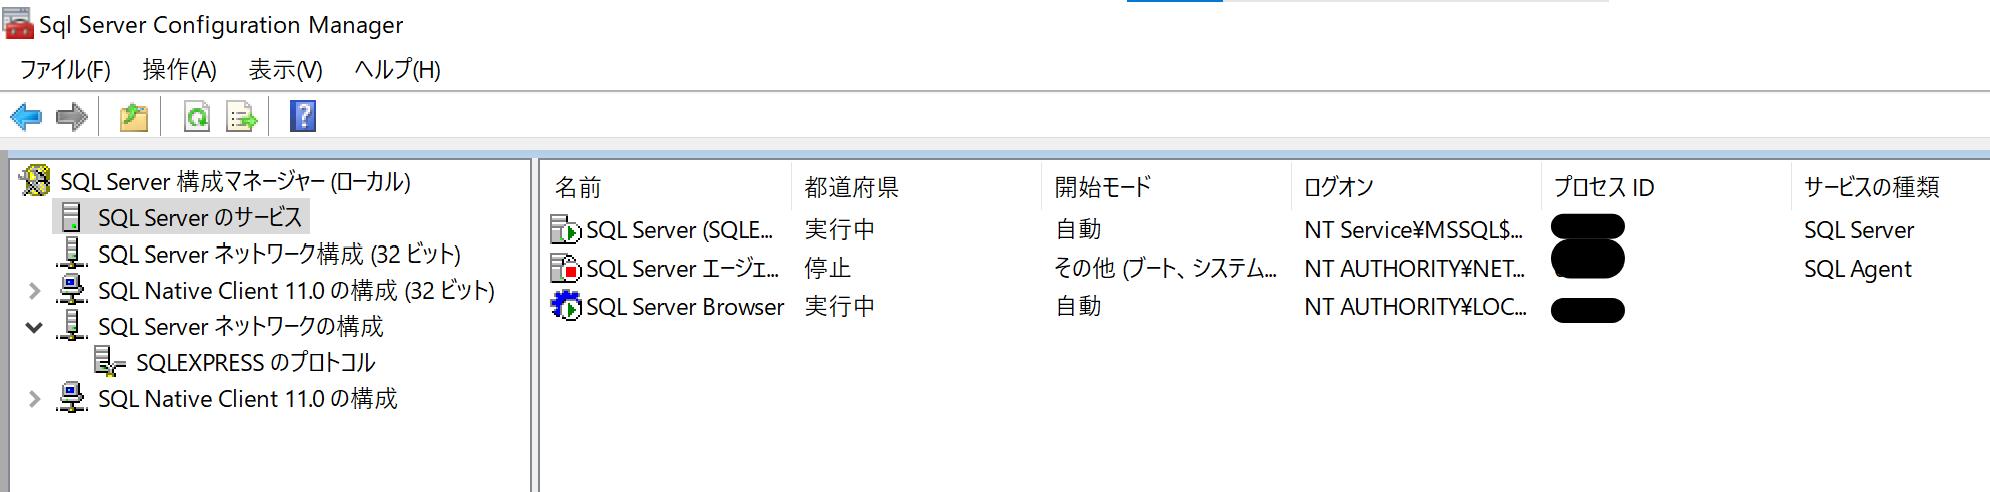 SQL Serverのサービス設定画面